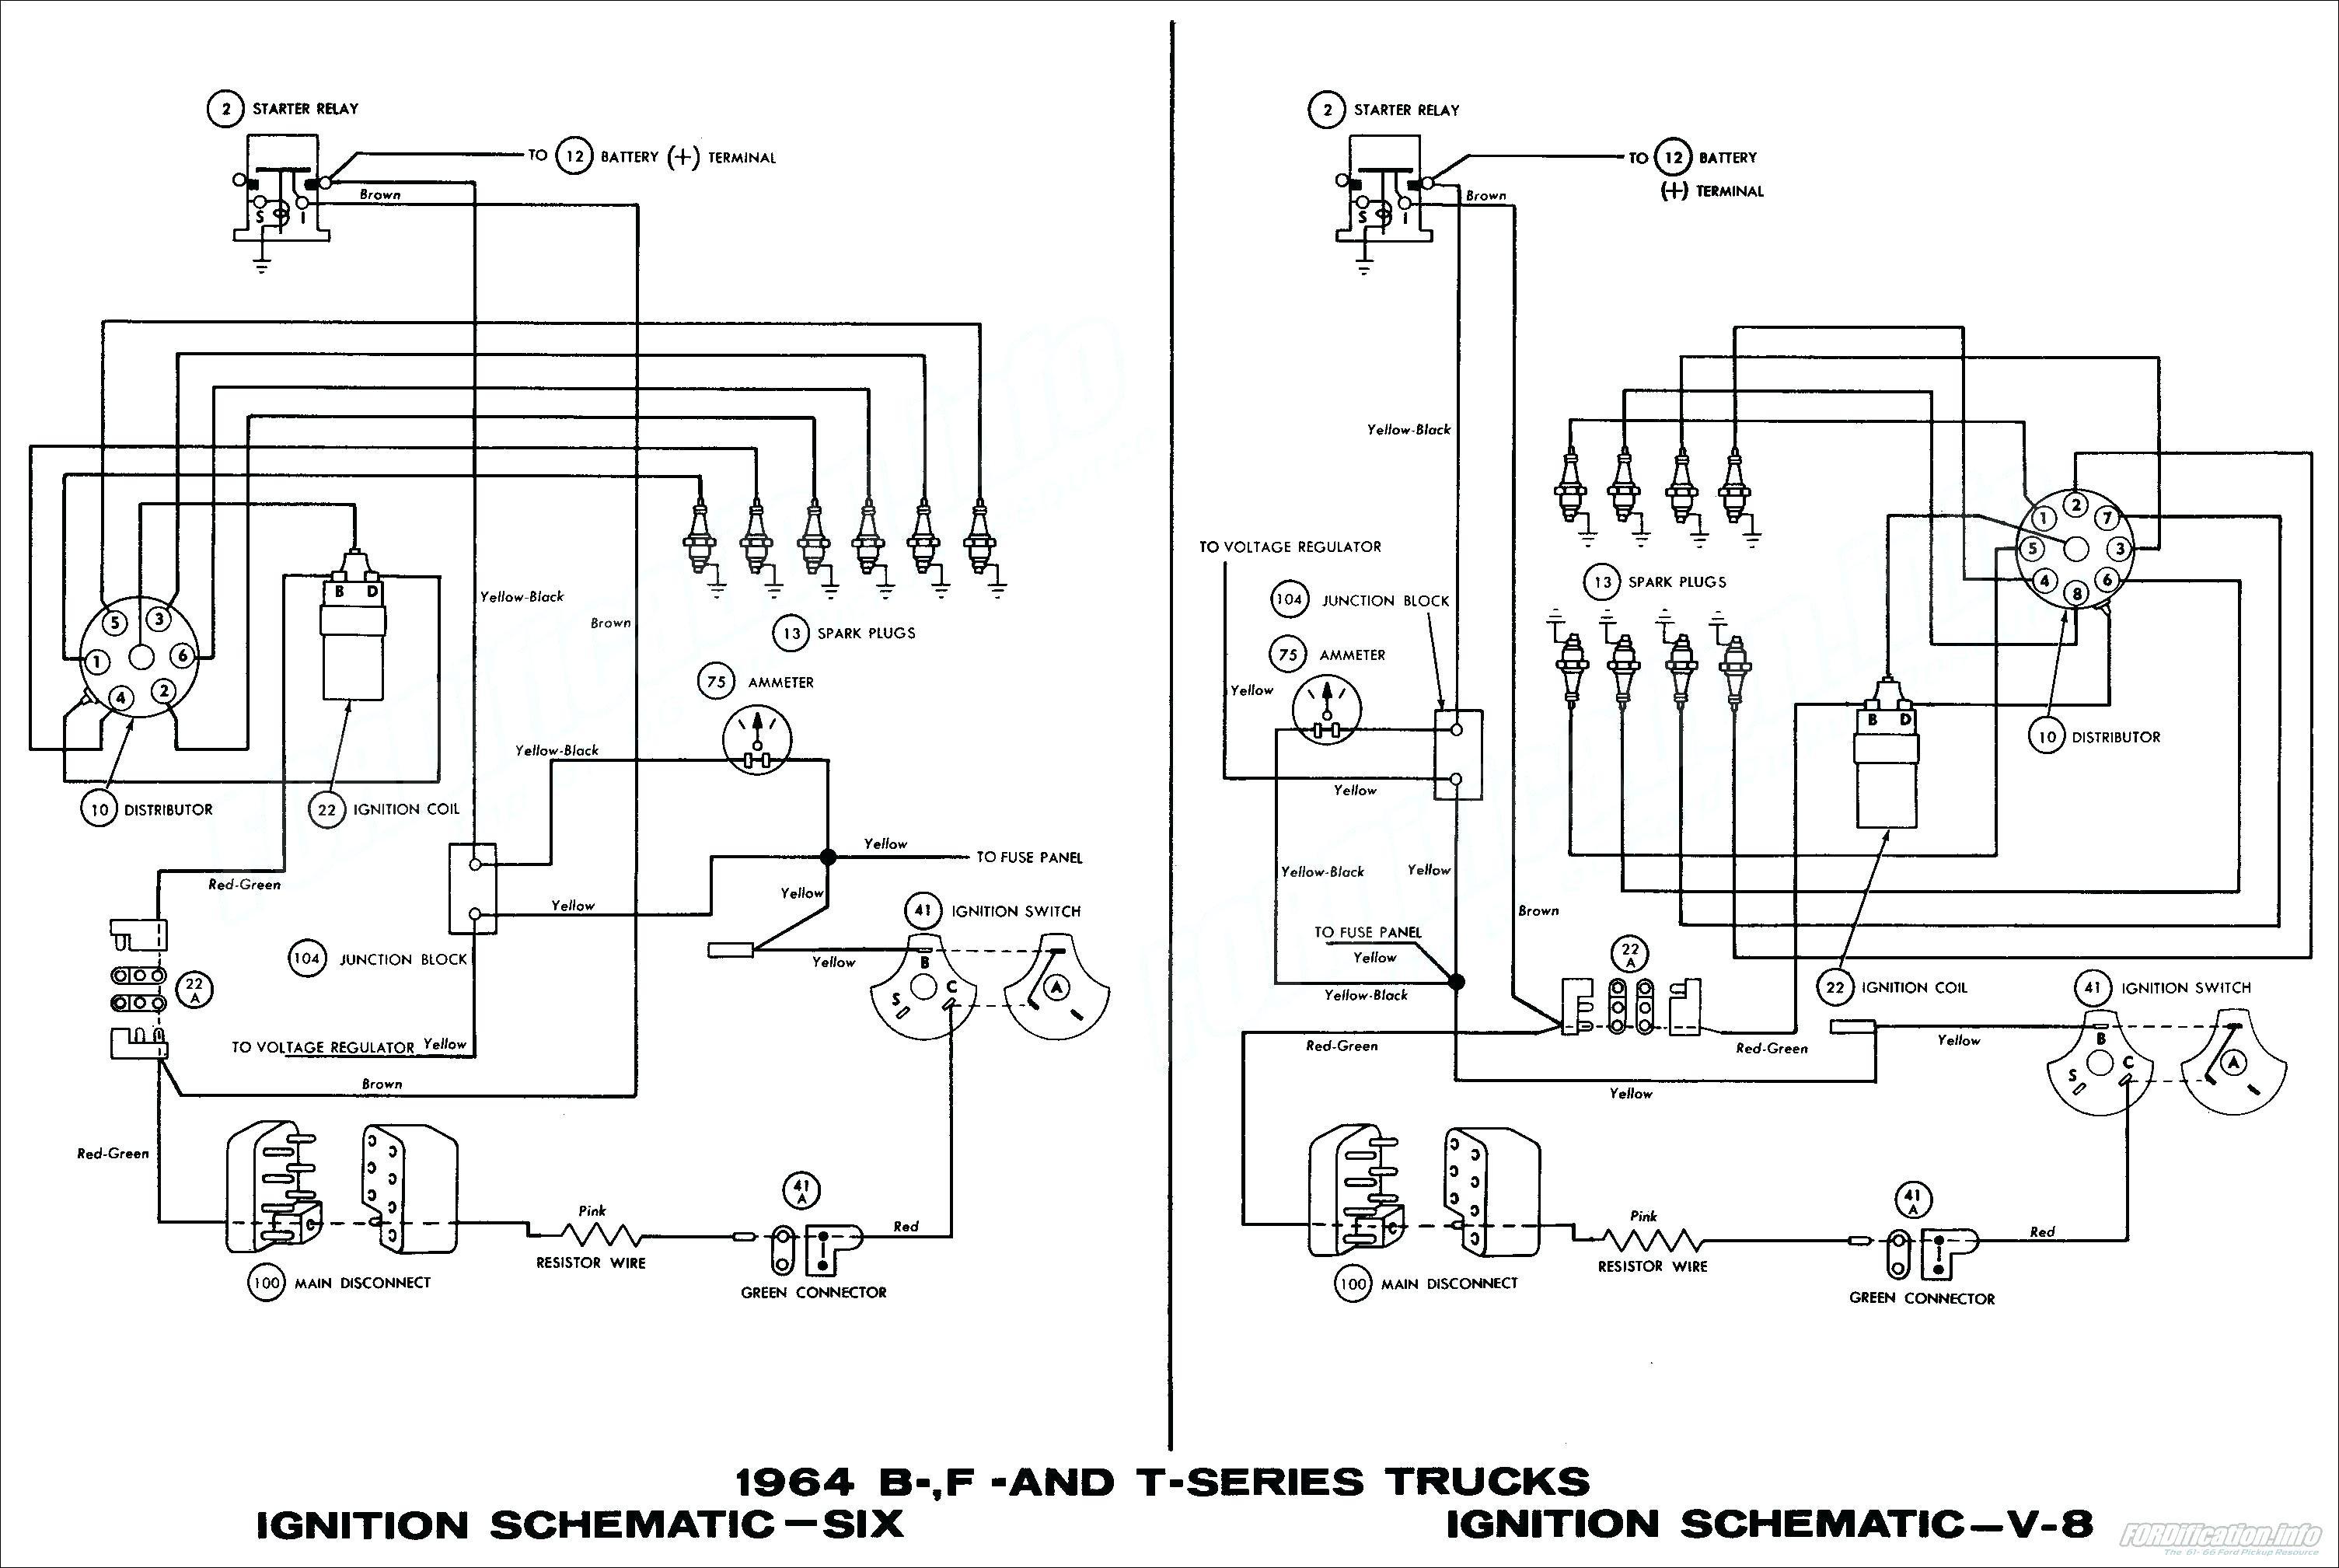 Chrysler 3 8 Engine Diagram Serpentine Belt Diagram Chrysler 300 Wiring Diagram 7 Pin Plug Of Chrysler 3 8 Engine Diagram